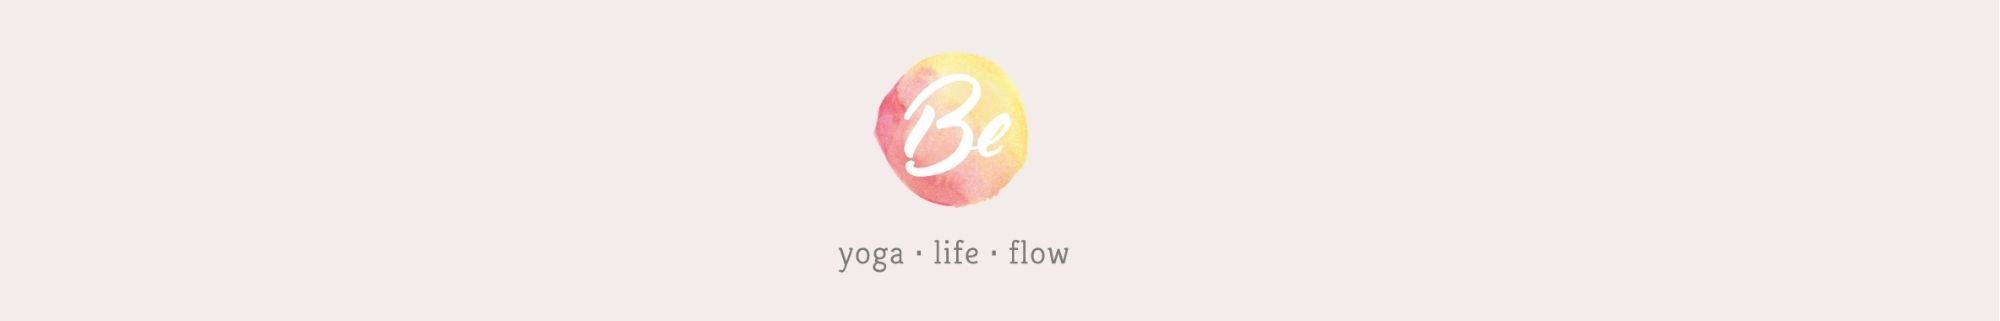 Yoga Wander Retreat Be Your way Yoga